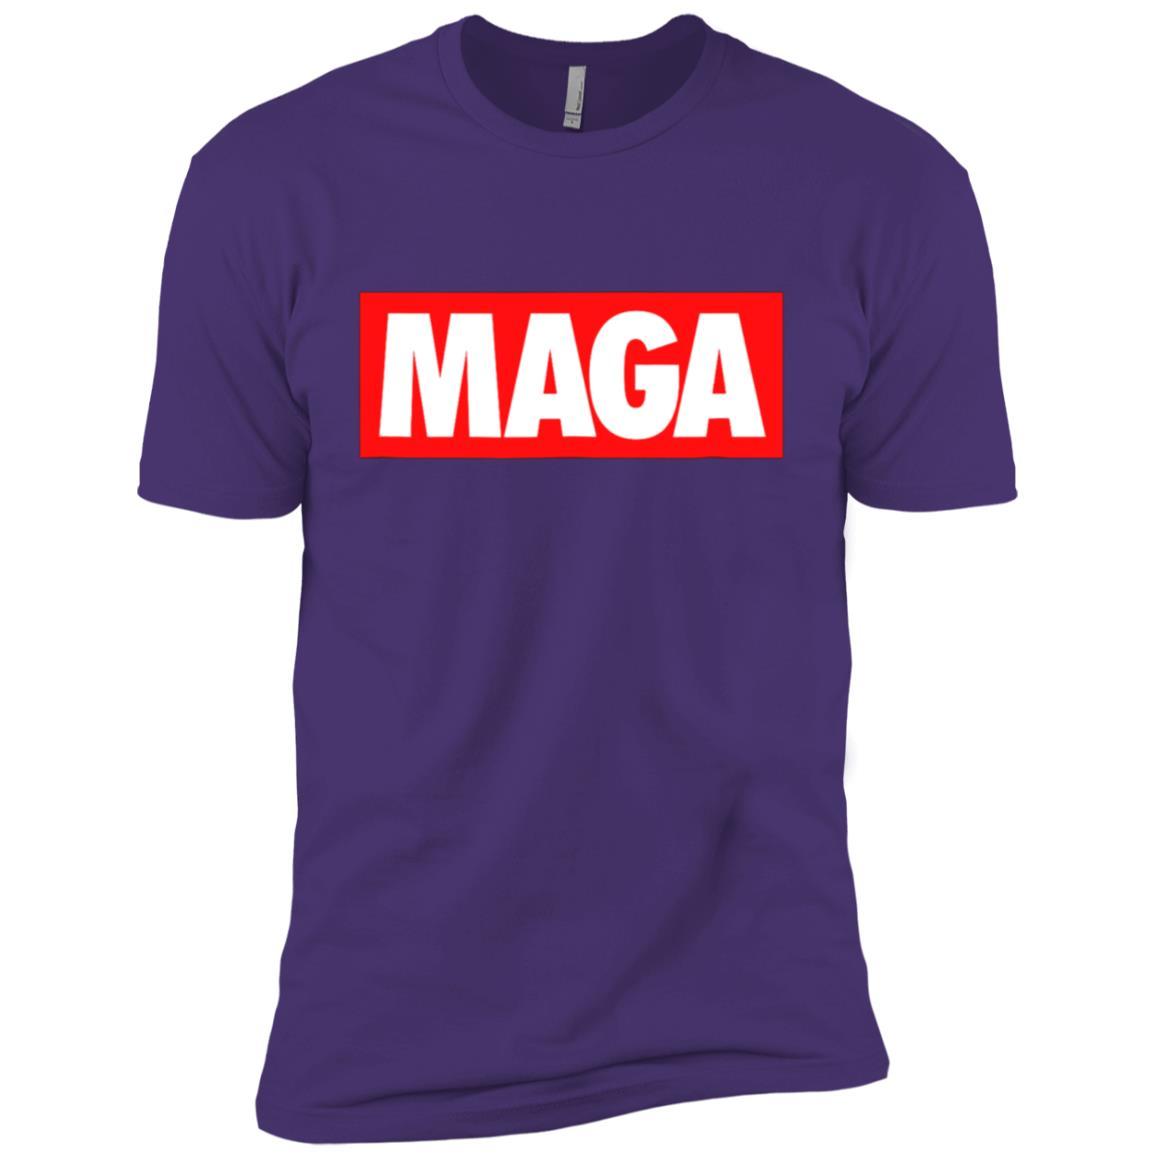 MAGA Retro America First Trump 2020 Republican Gift Men Short Sleeve T-Shirt